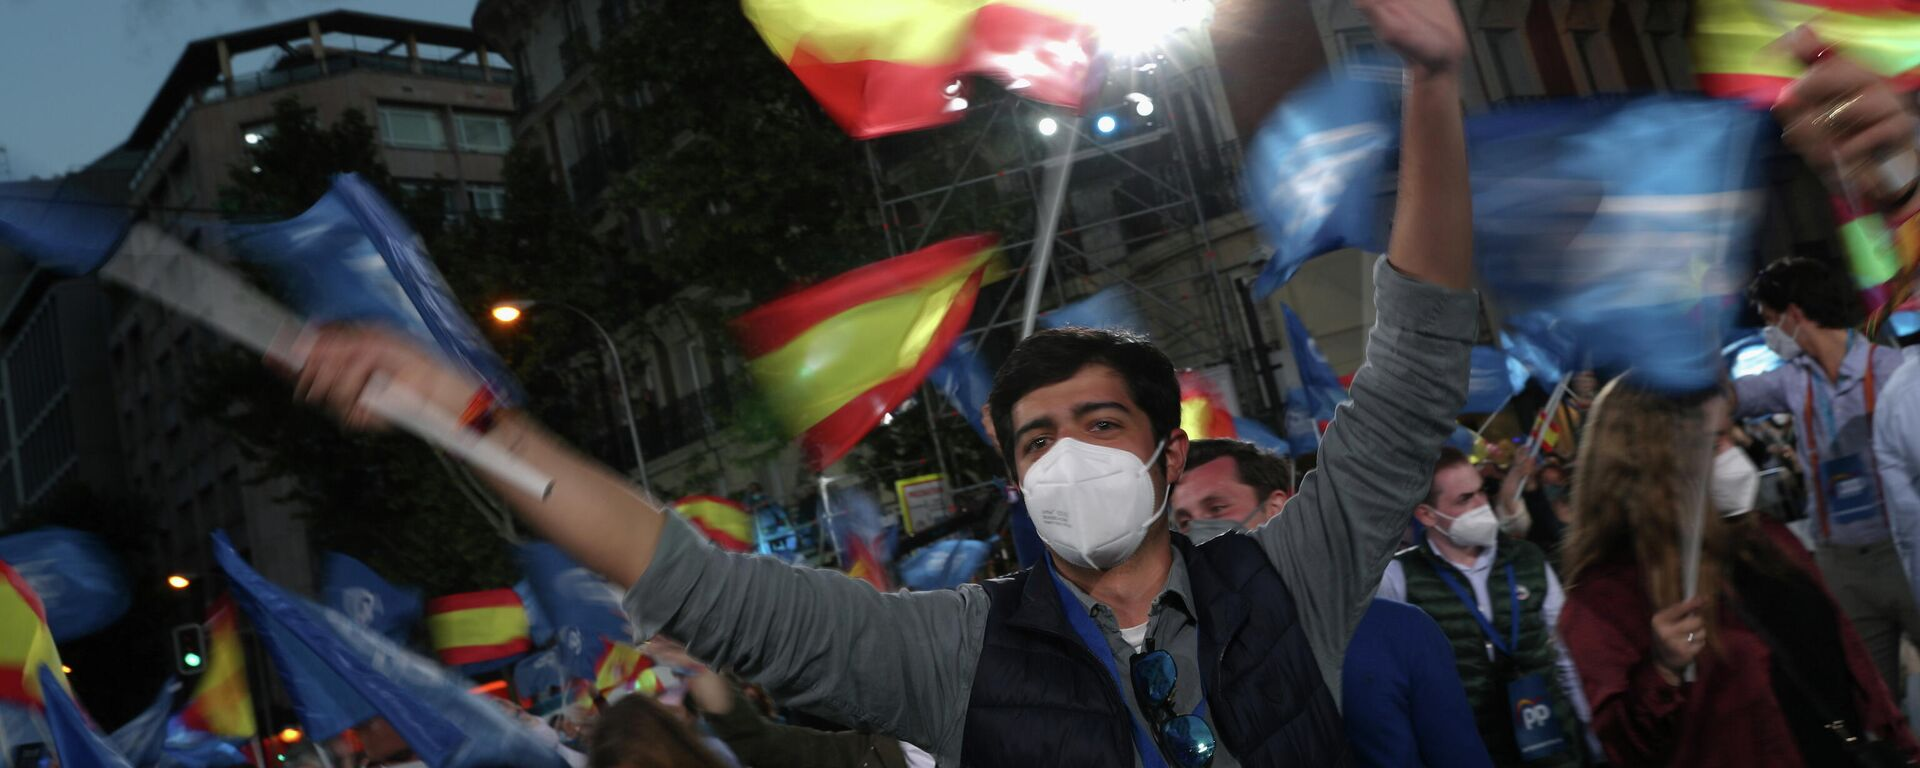 Elecciones en Madrid - Sputnik Mundo, 1920, 04.05.2021